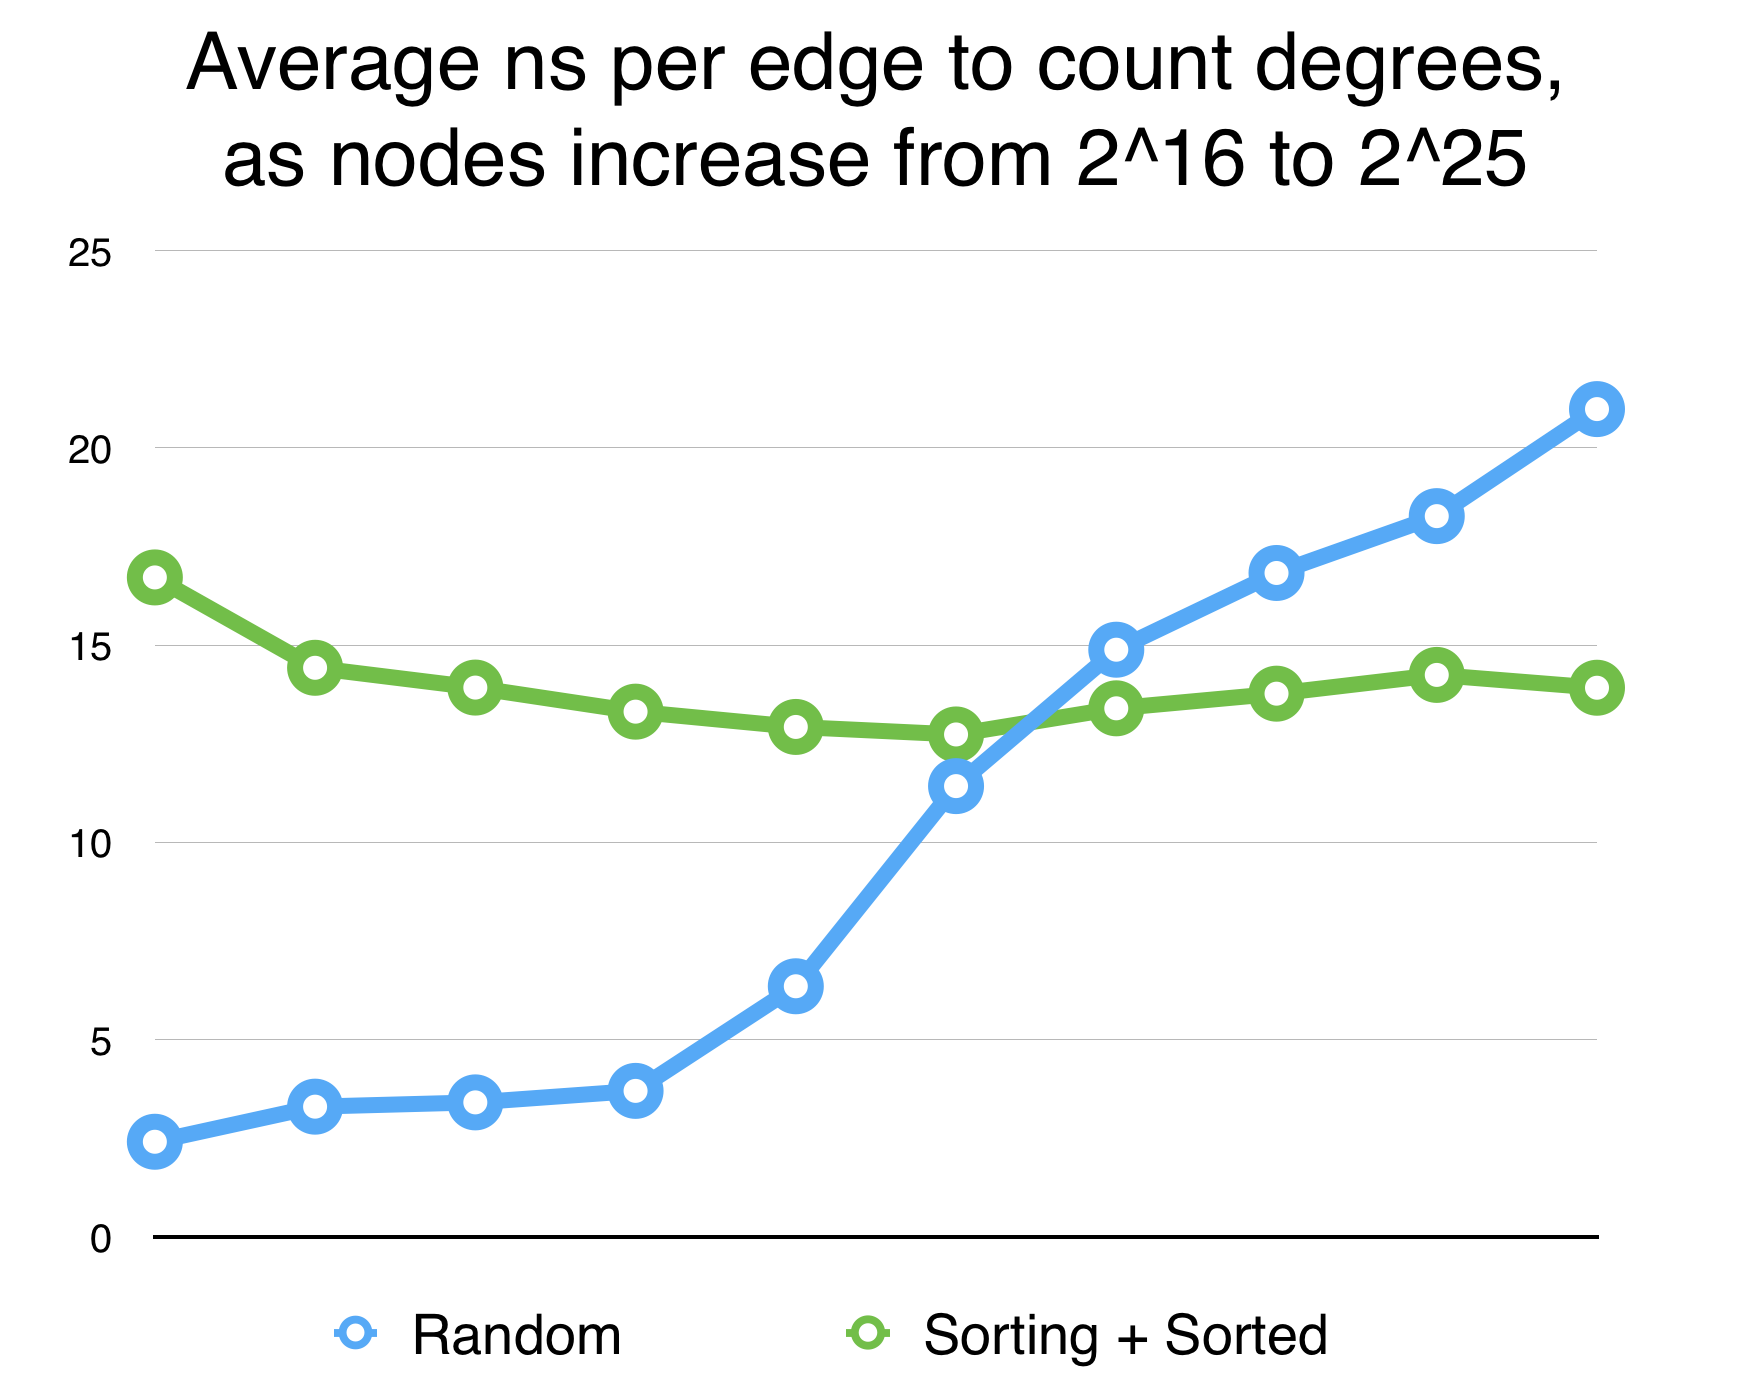 Counting degrees, badly vs radix